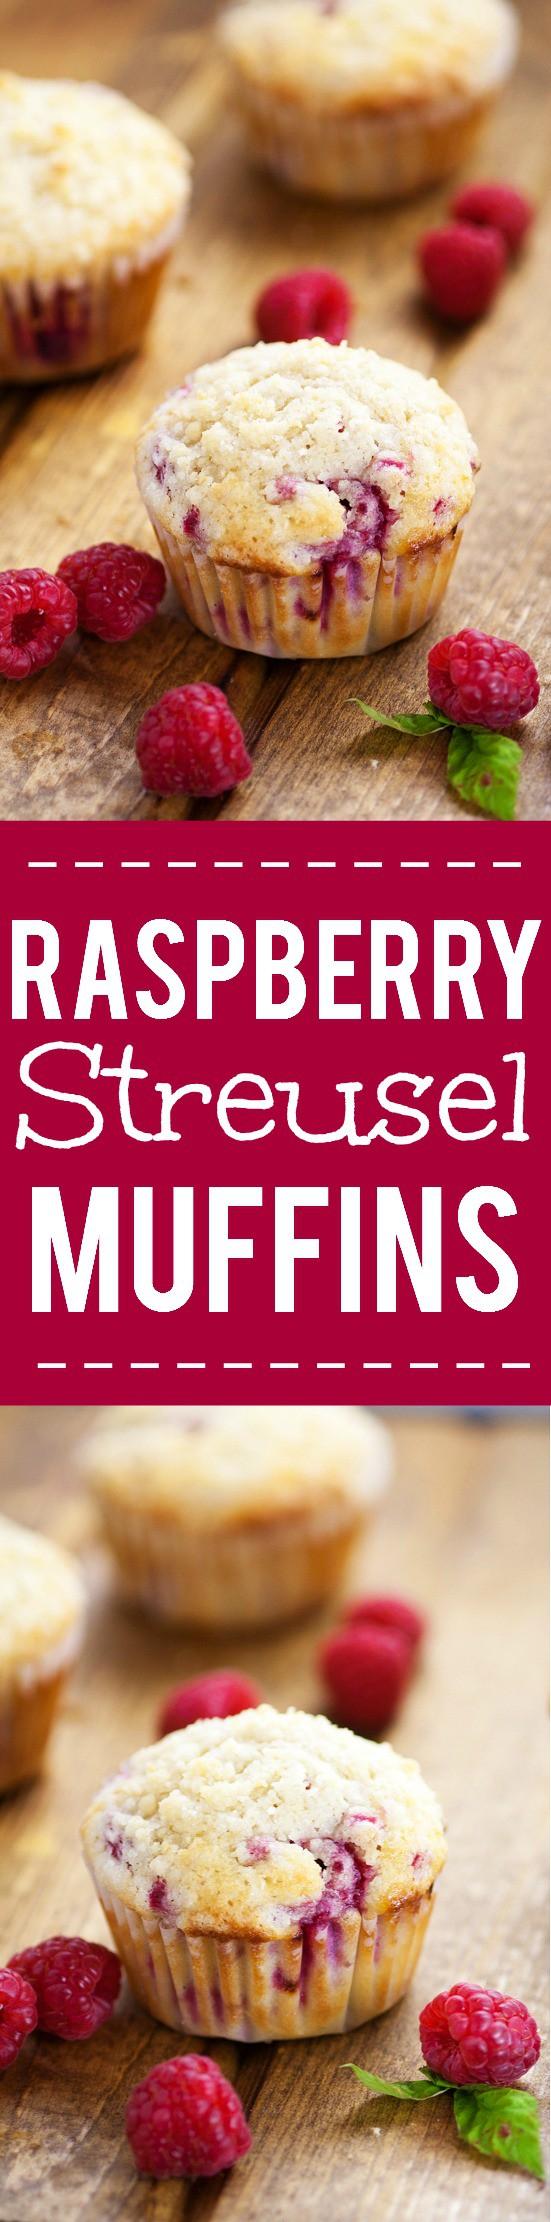 Raspberry Streusel Muffins Recipe -Sweet but tart, these fresh Raspberry Streusel Muffins topped with a heavenly, crunchy streusel will make breakfast a decadent treat. Easy breakfast recipe that's also freezer friendly. Fabulous!